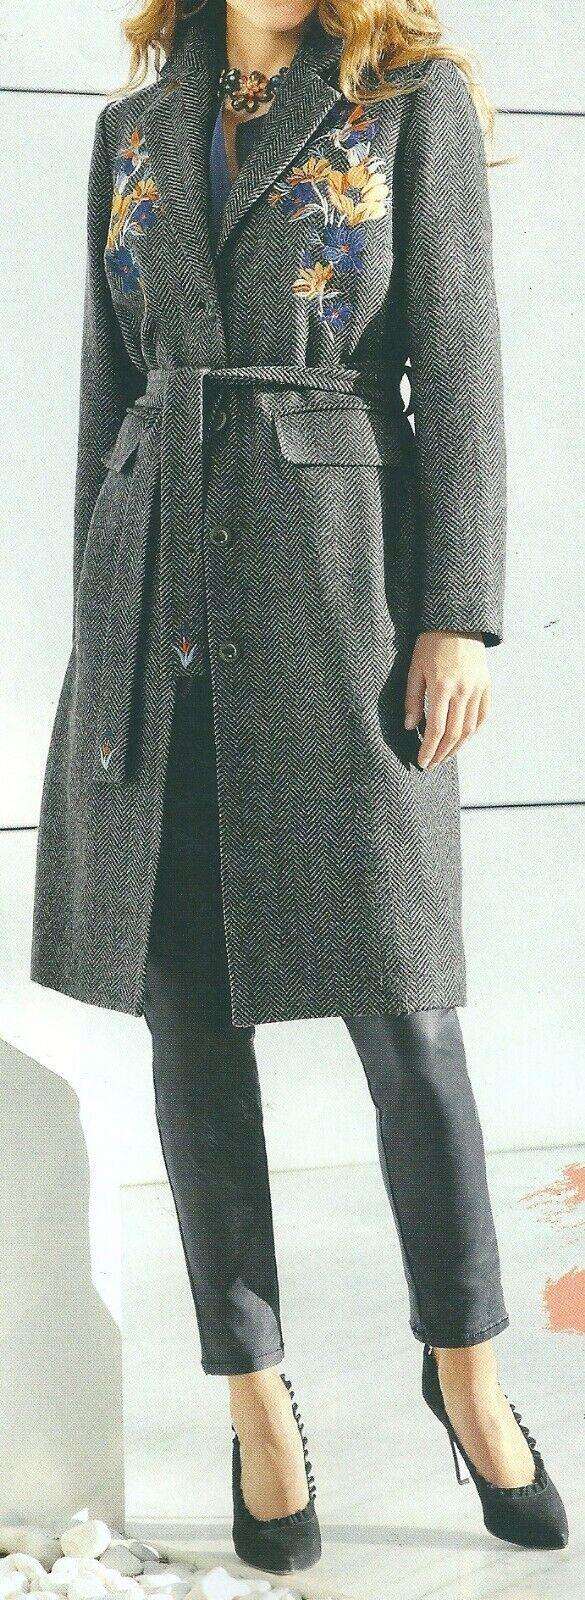 Wollmantel Damännermantel Übergangsmantel Mantel Wolle grau meliert Gr. 42